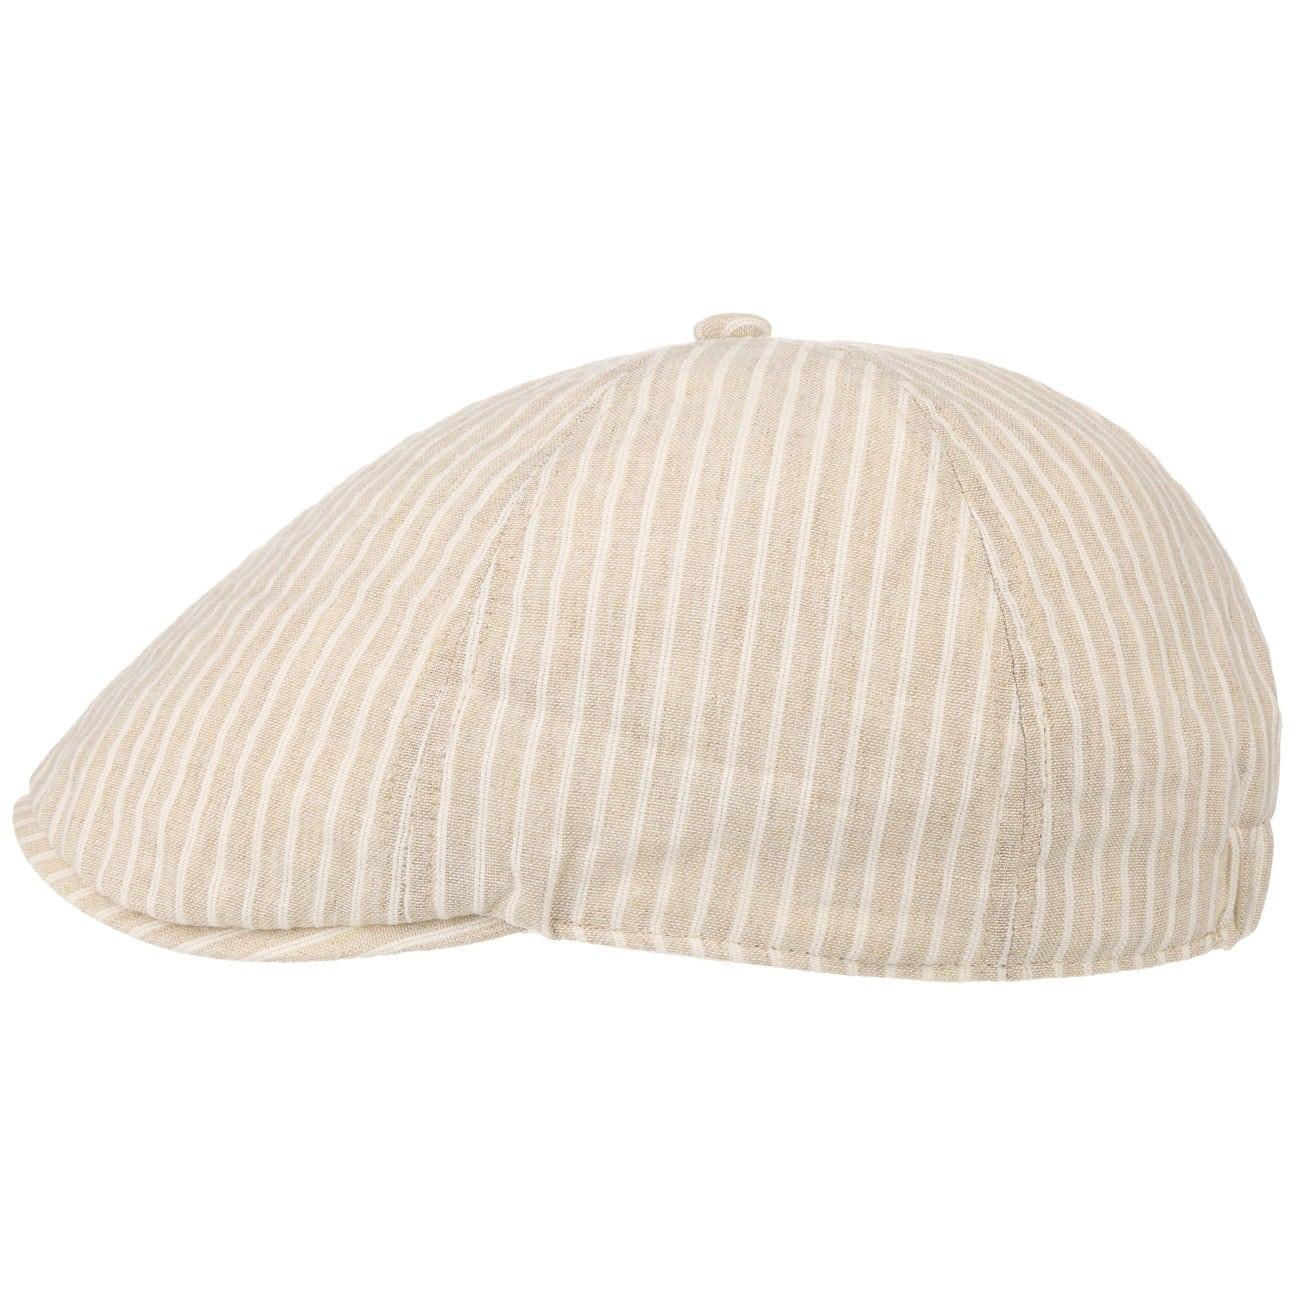 Casquette Cotton Stripes by Lipodo  casquette en coton